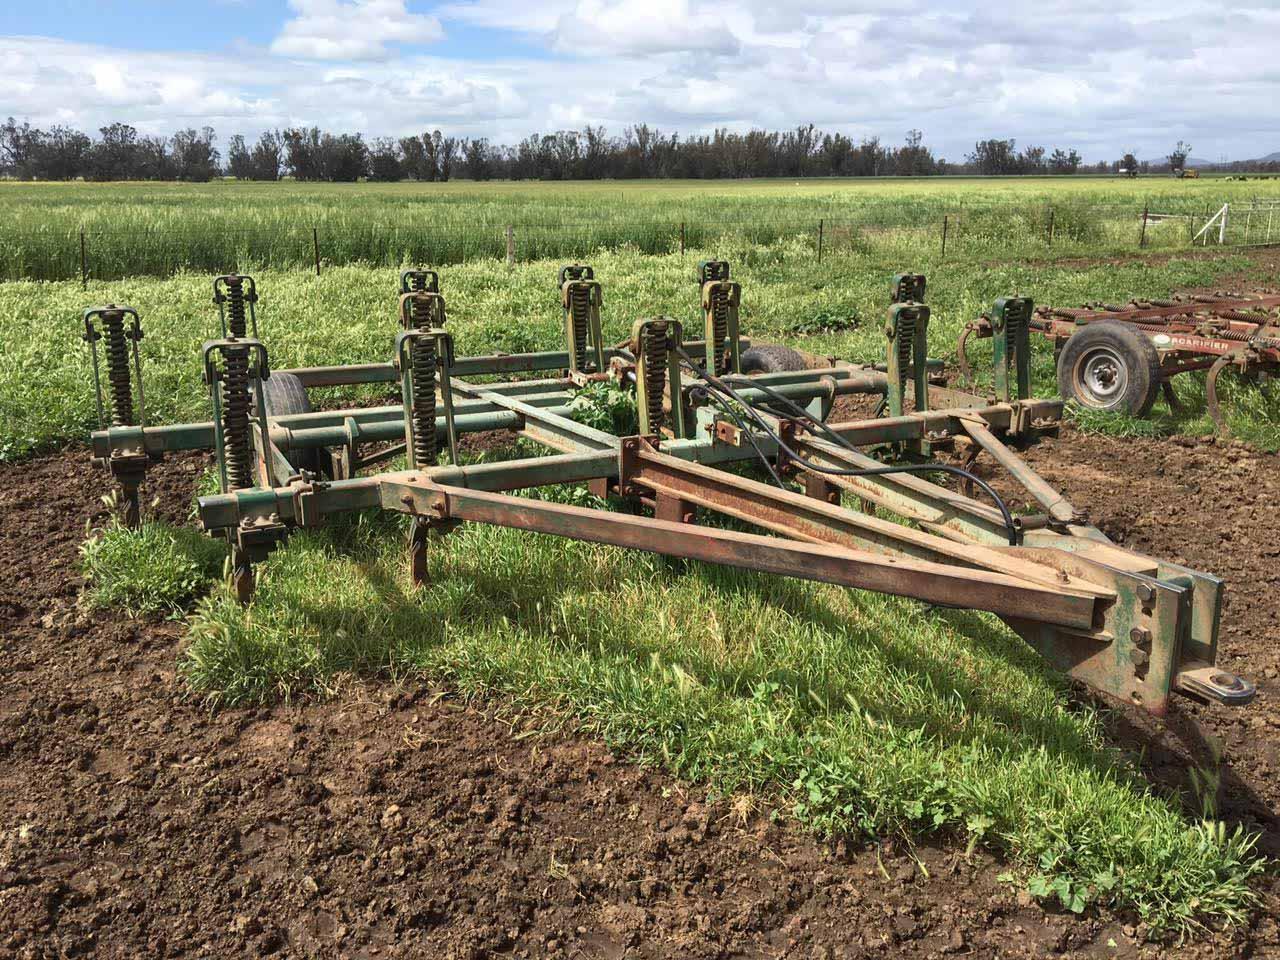 John Deere Farm Equipments